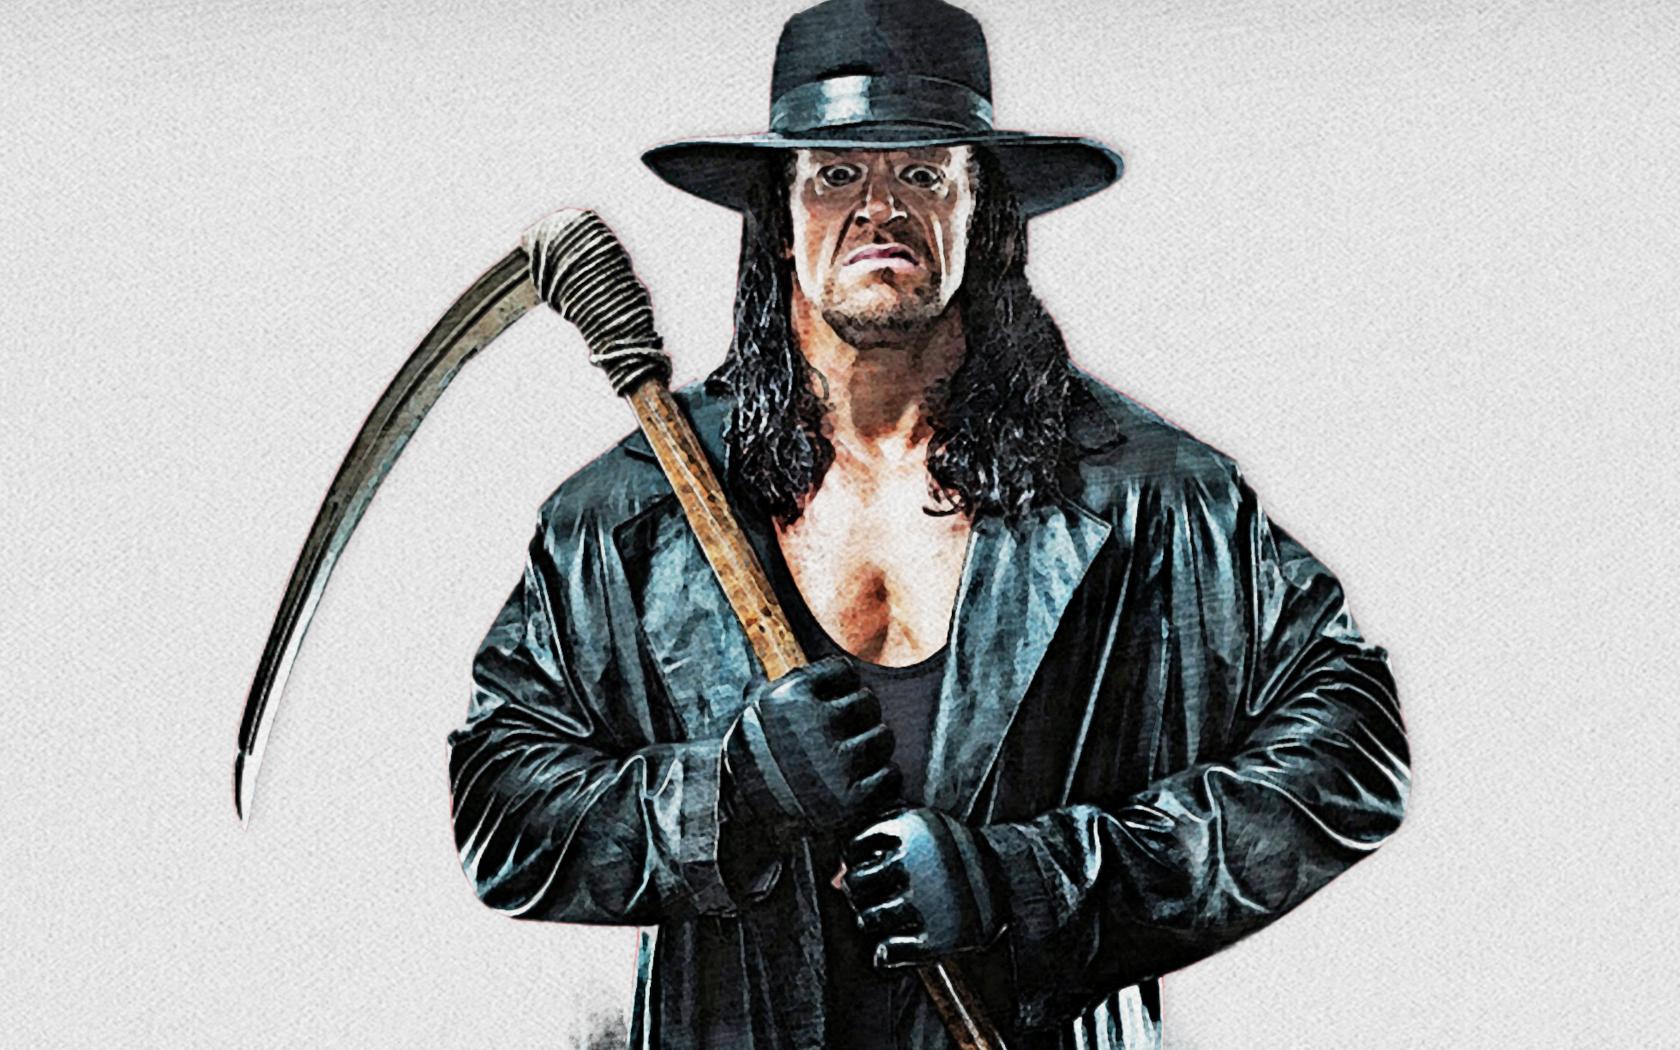 undertaker.png